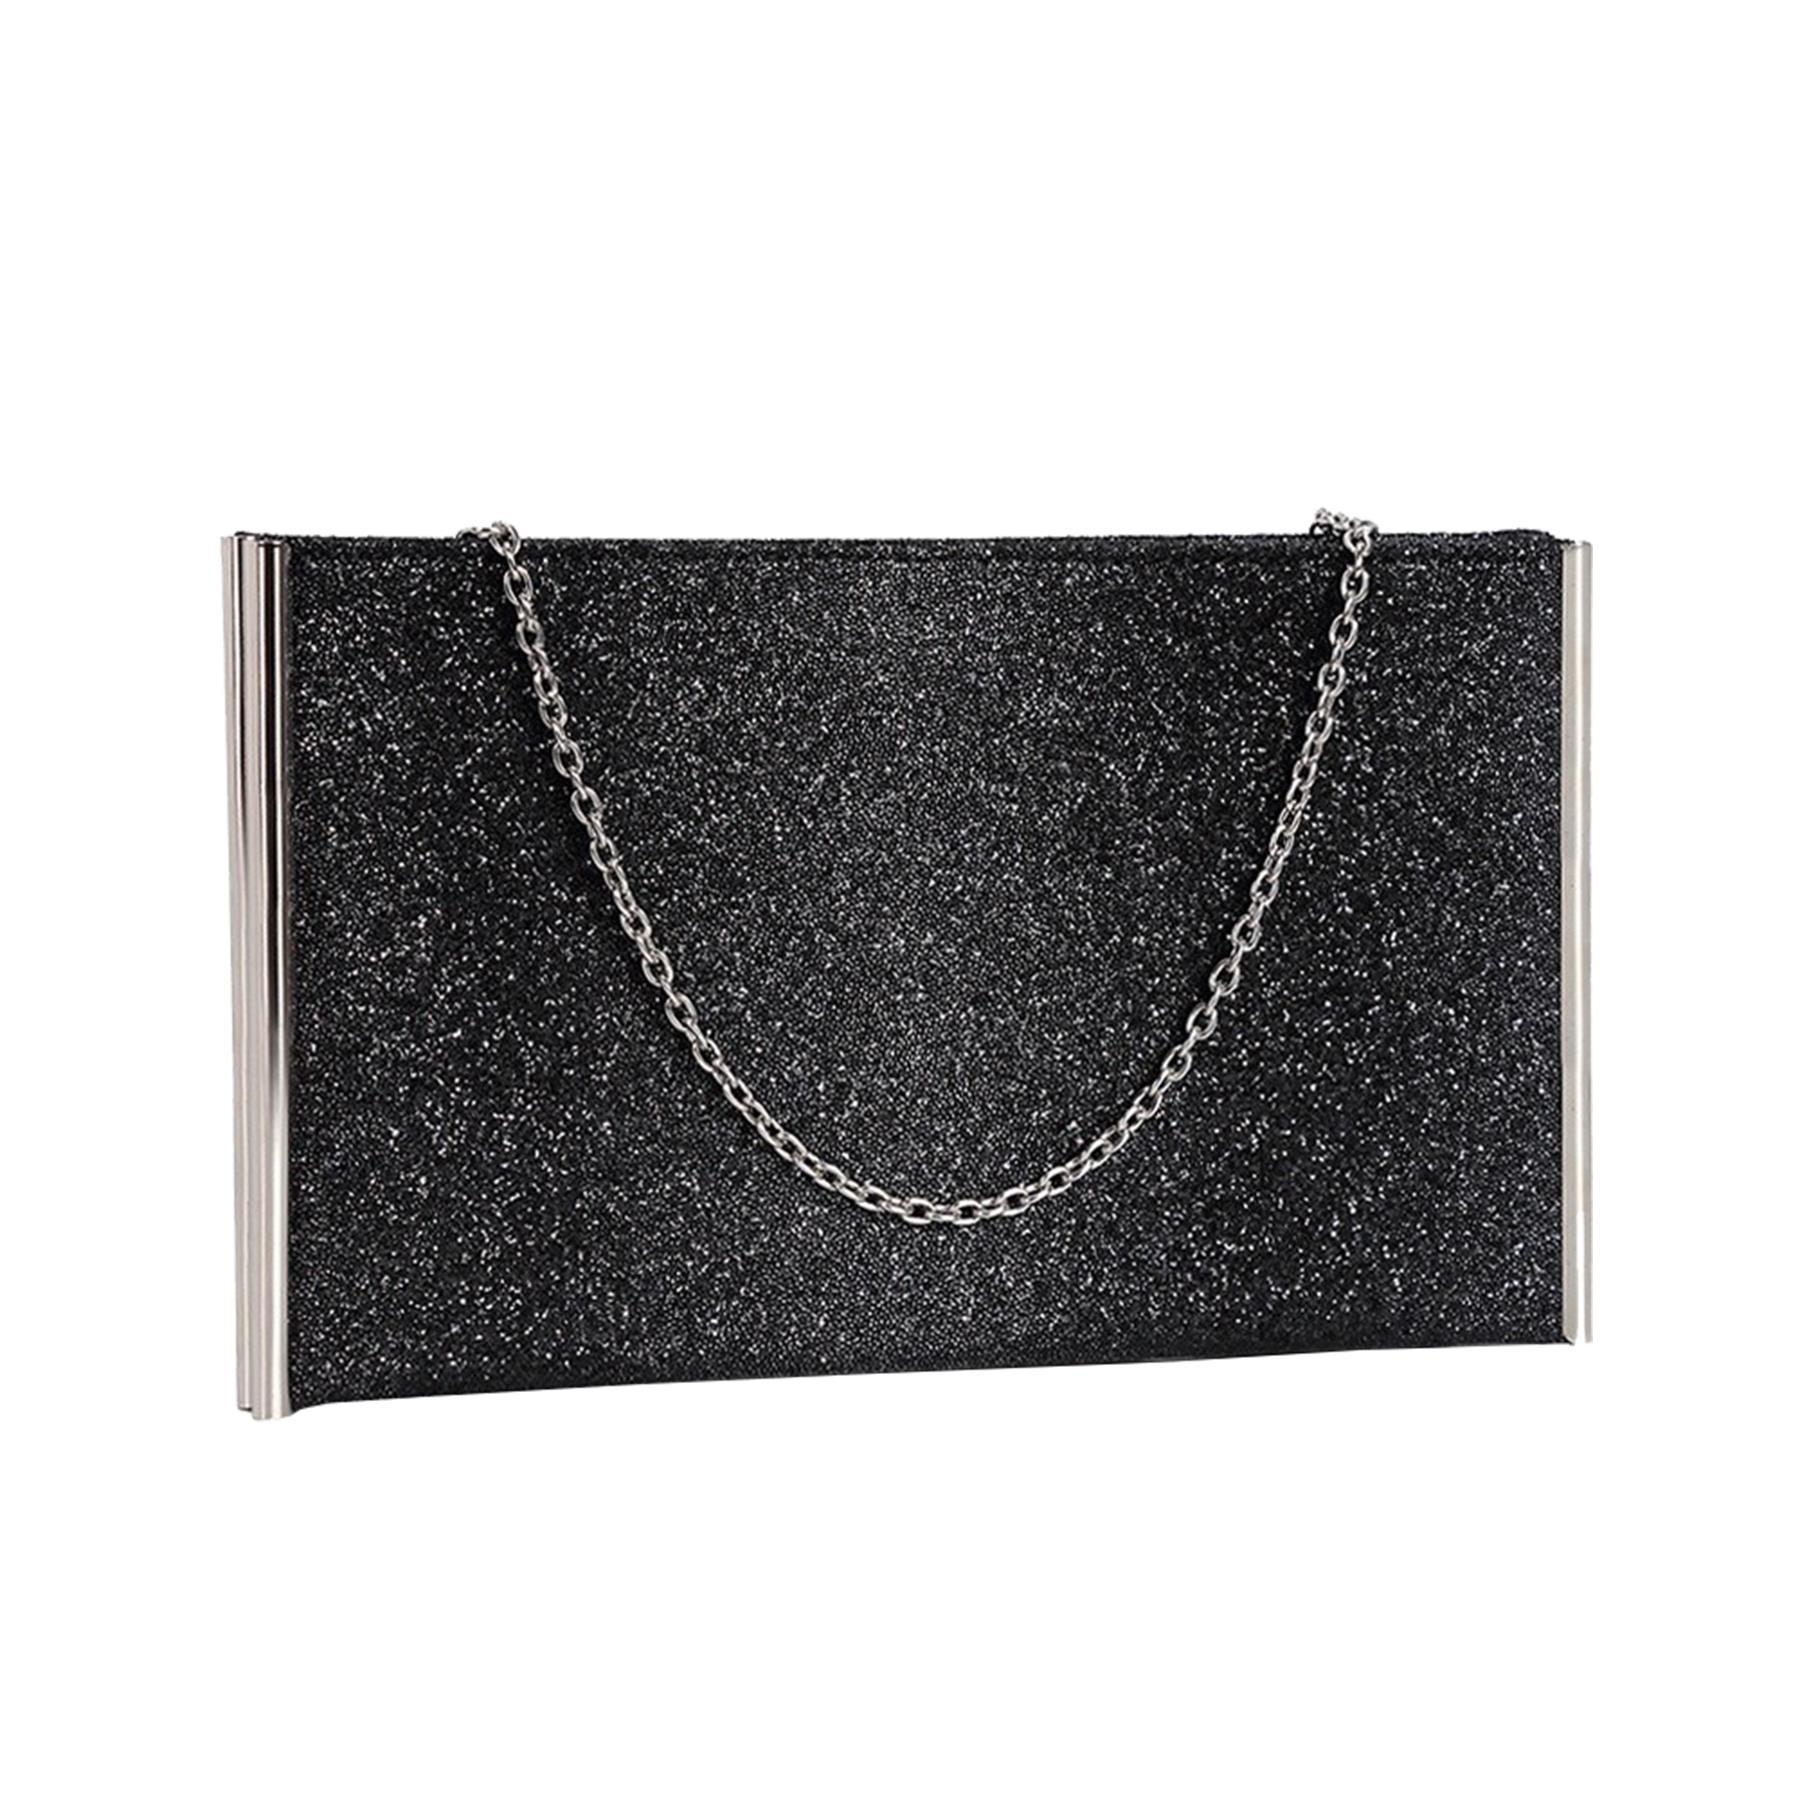 New-Ladies-Metallic-Trim-Velvet-Shimmer-Hologram-Croc-Evening-Clutch-Bag thumbnail 12